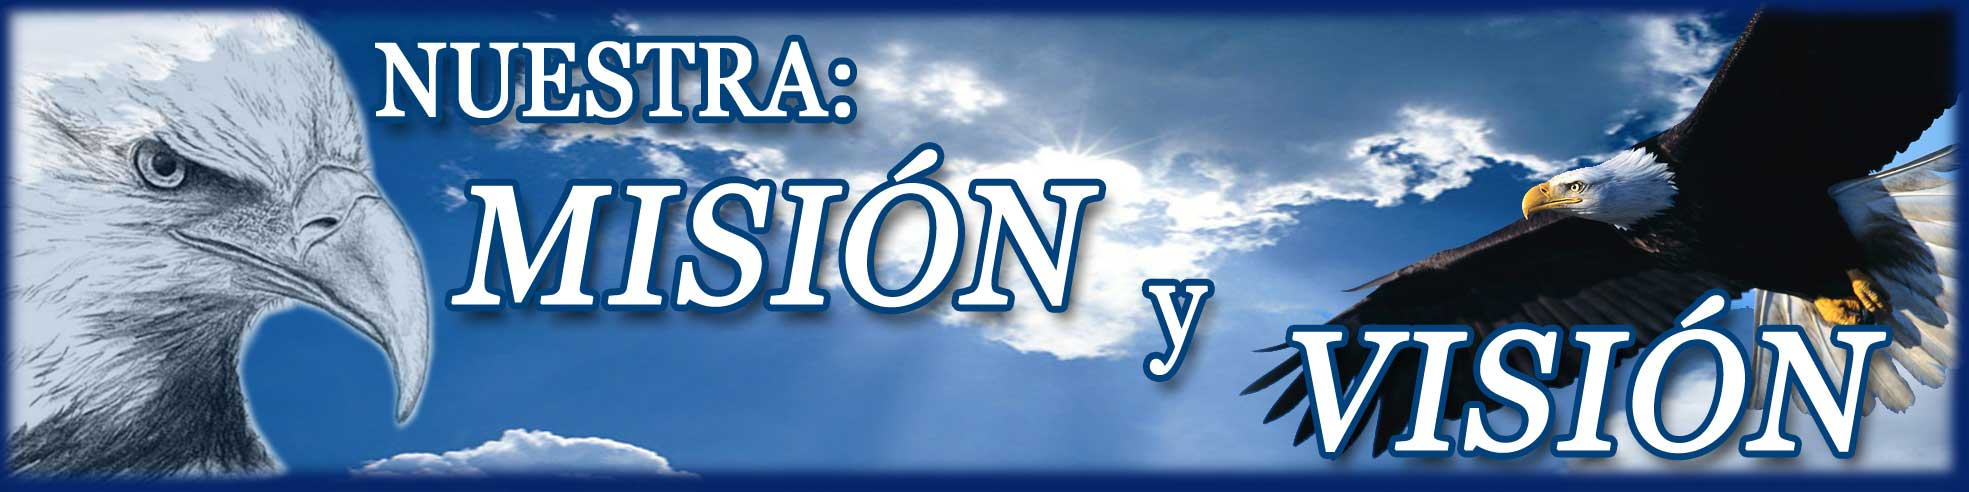 mision_vision en foto